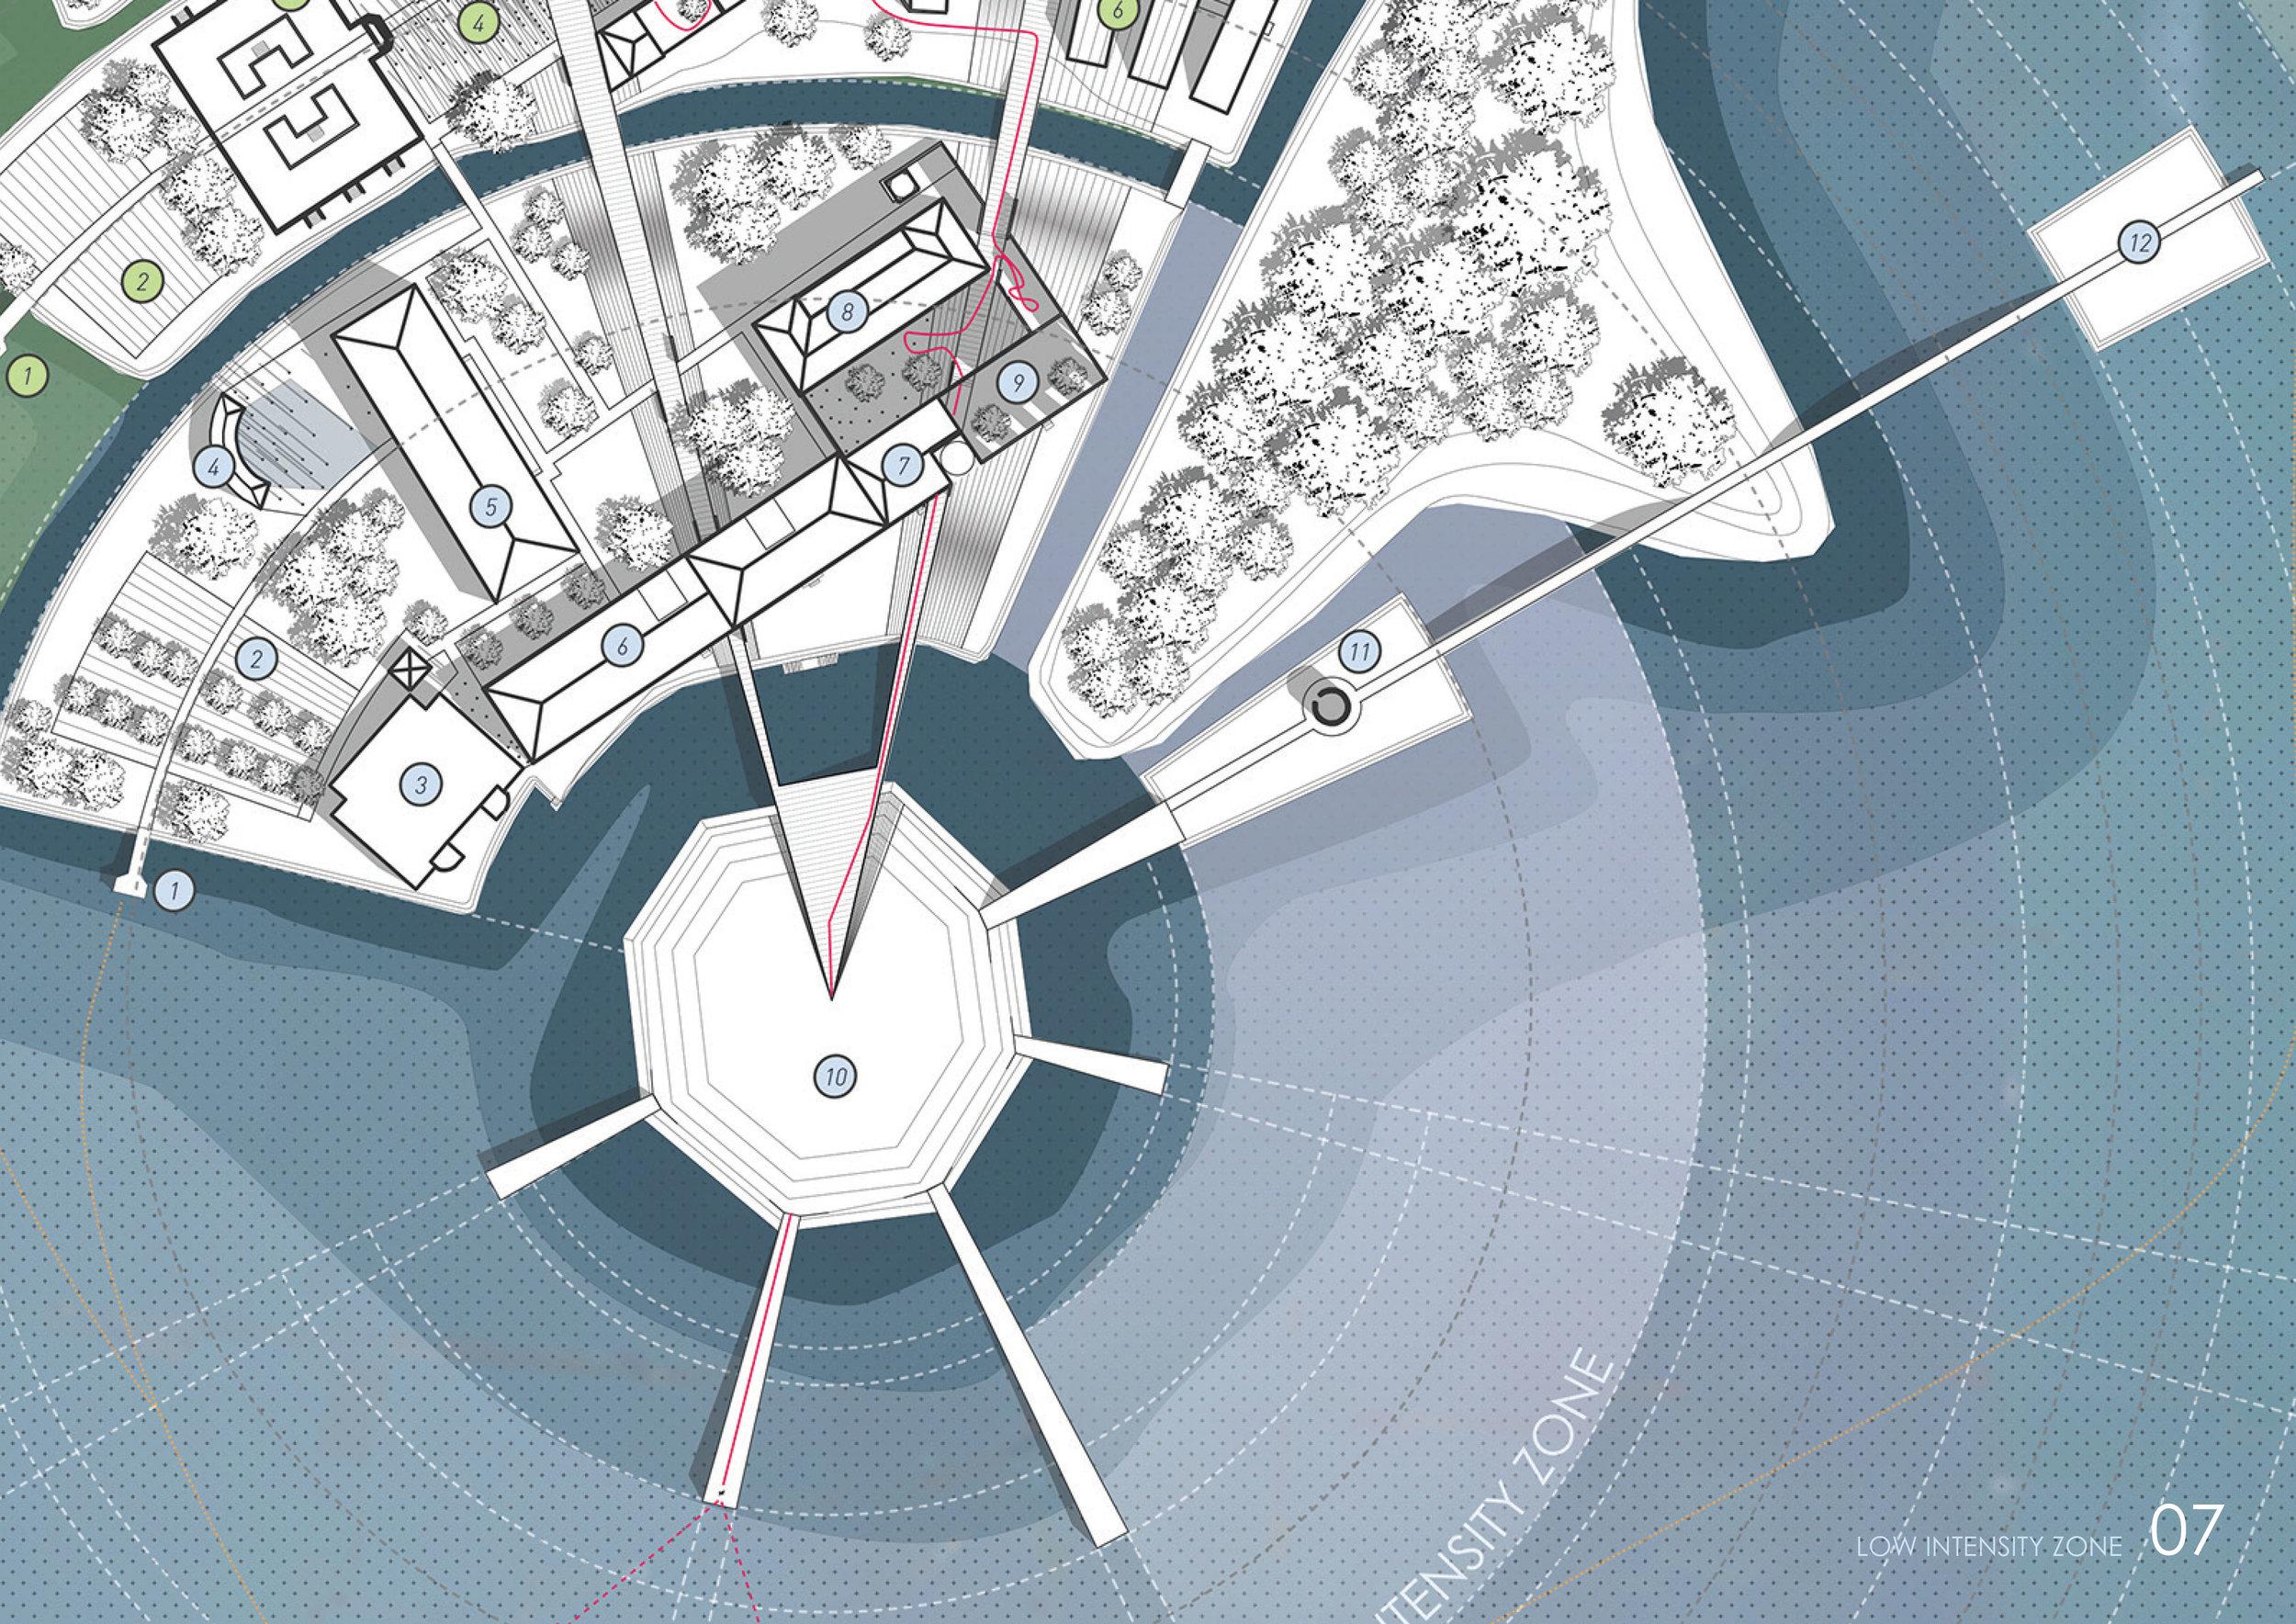 Univeristy Island Gradient Matt Fajkus Architecture MF MFx16_7.jpg